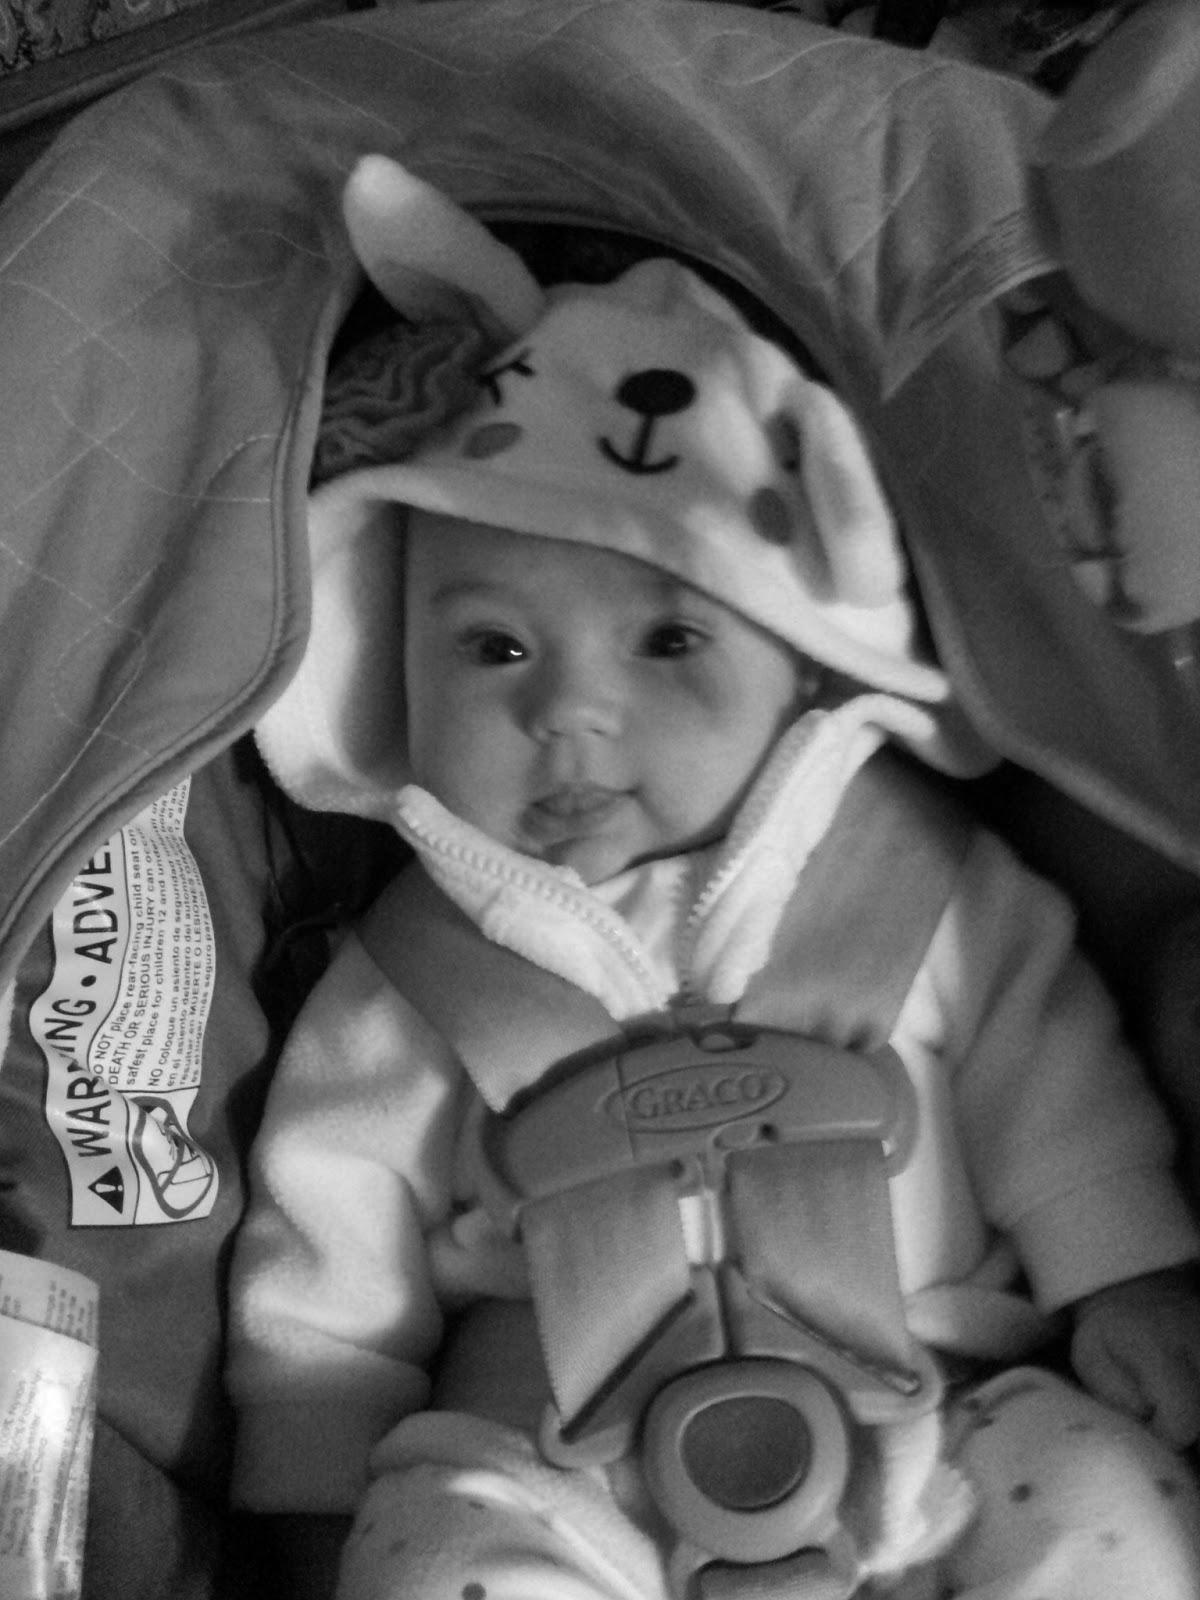 Lamby Baby